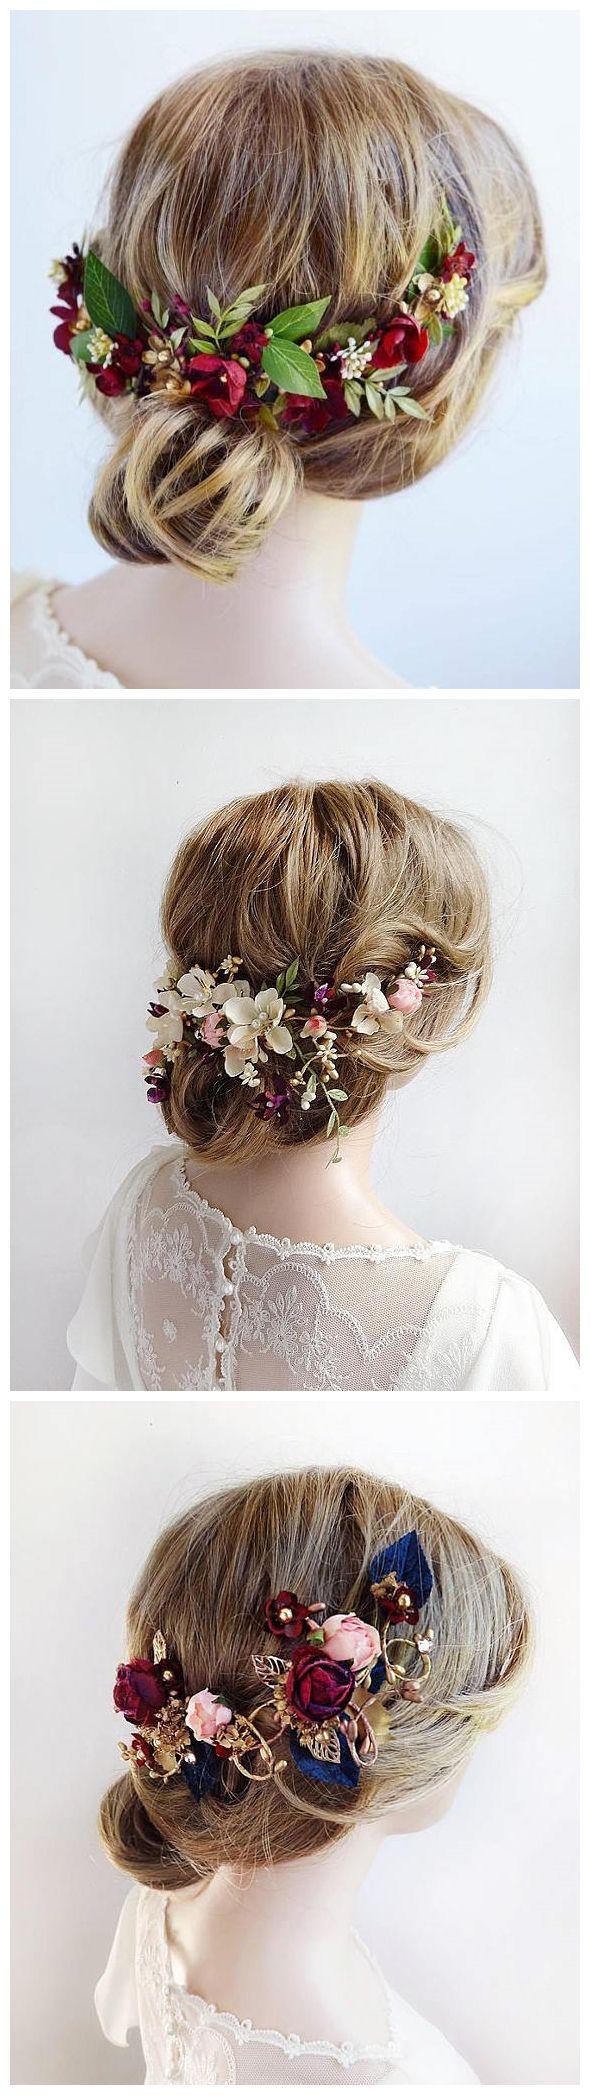 burgundy headpiece, floral hair piece, burgundy hair clip, bridal headpiece, bur...